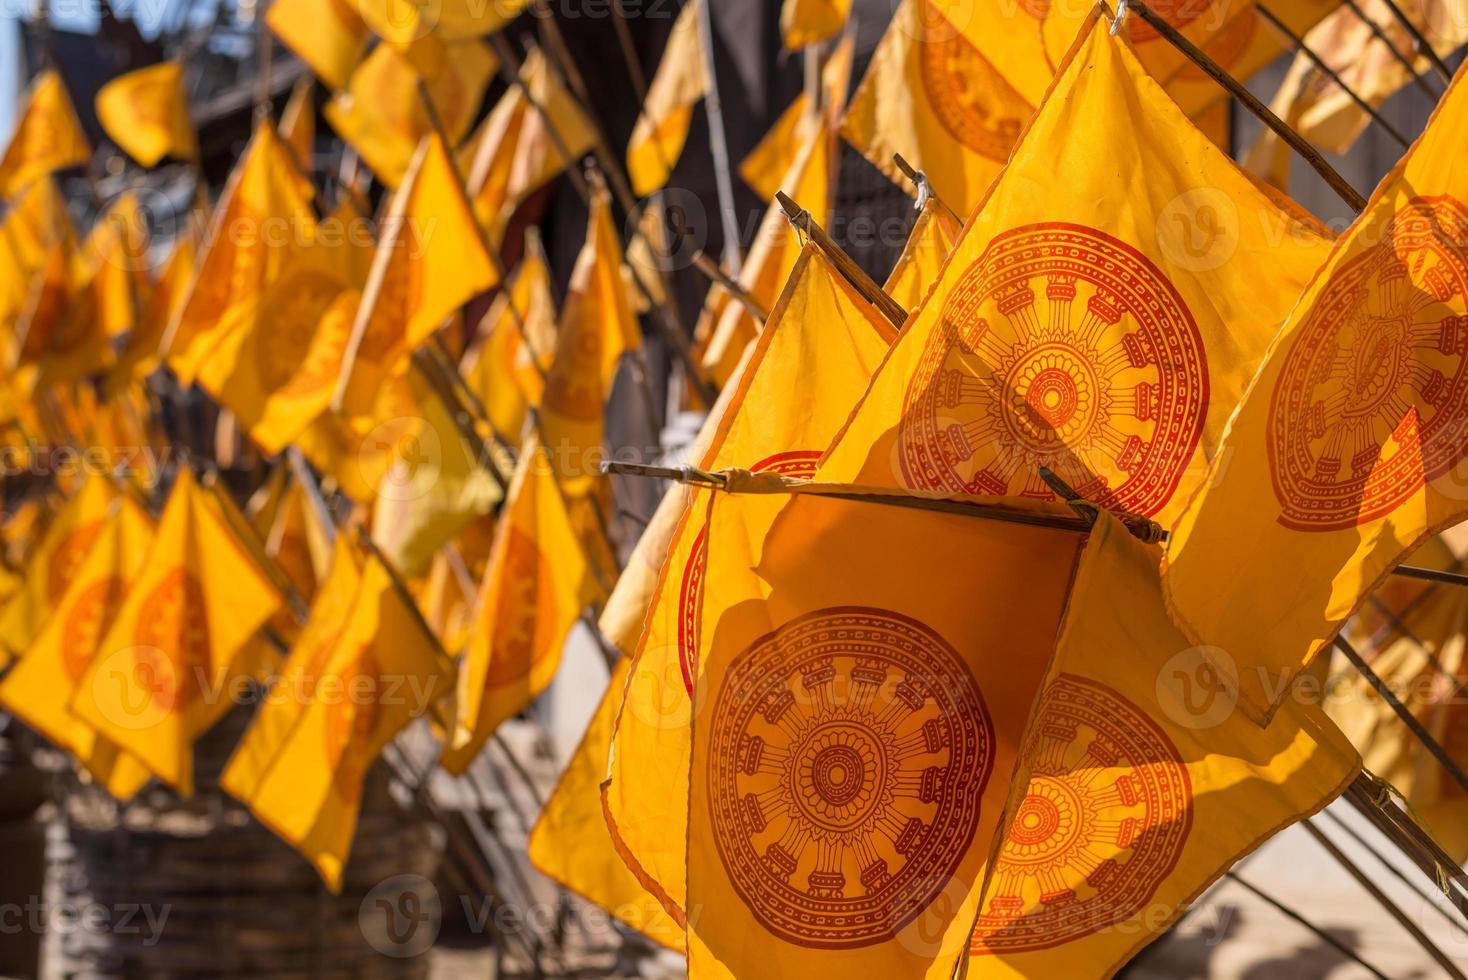 dharmacakra flaggsymbol, lagets hjul foto